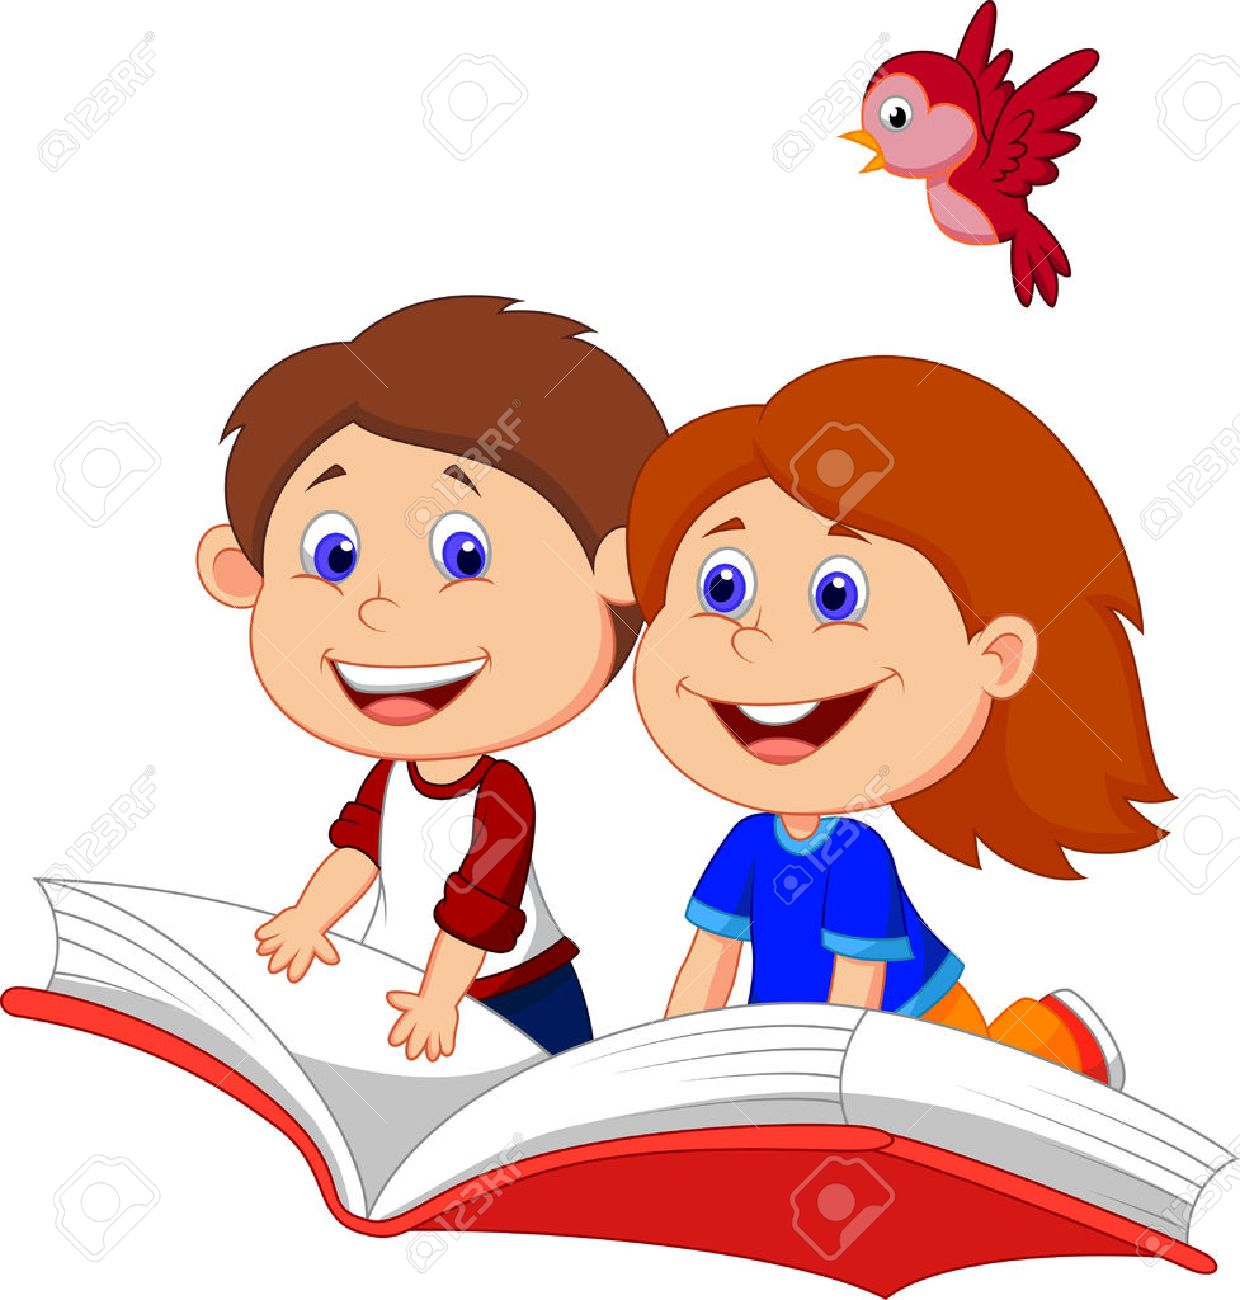 Cartoon Boy and girl flying on a book Stock Vector - 22466969